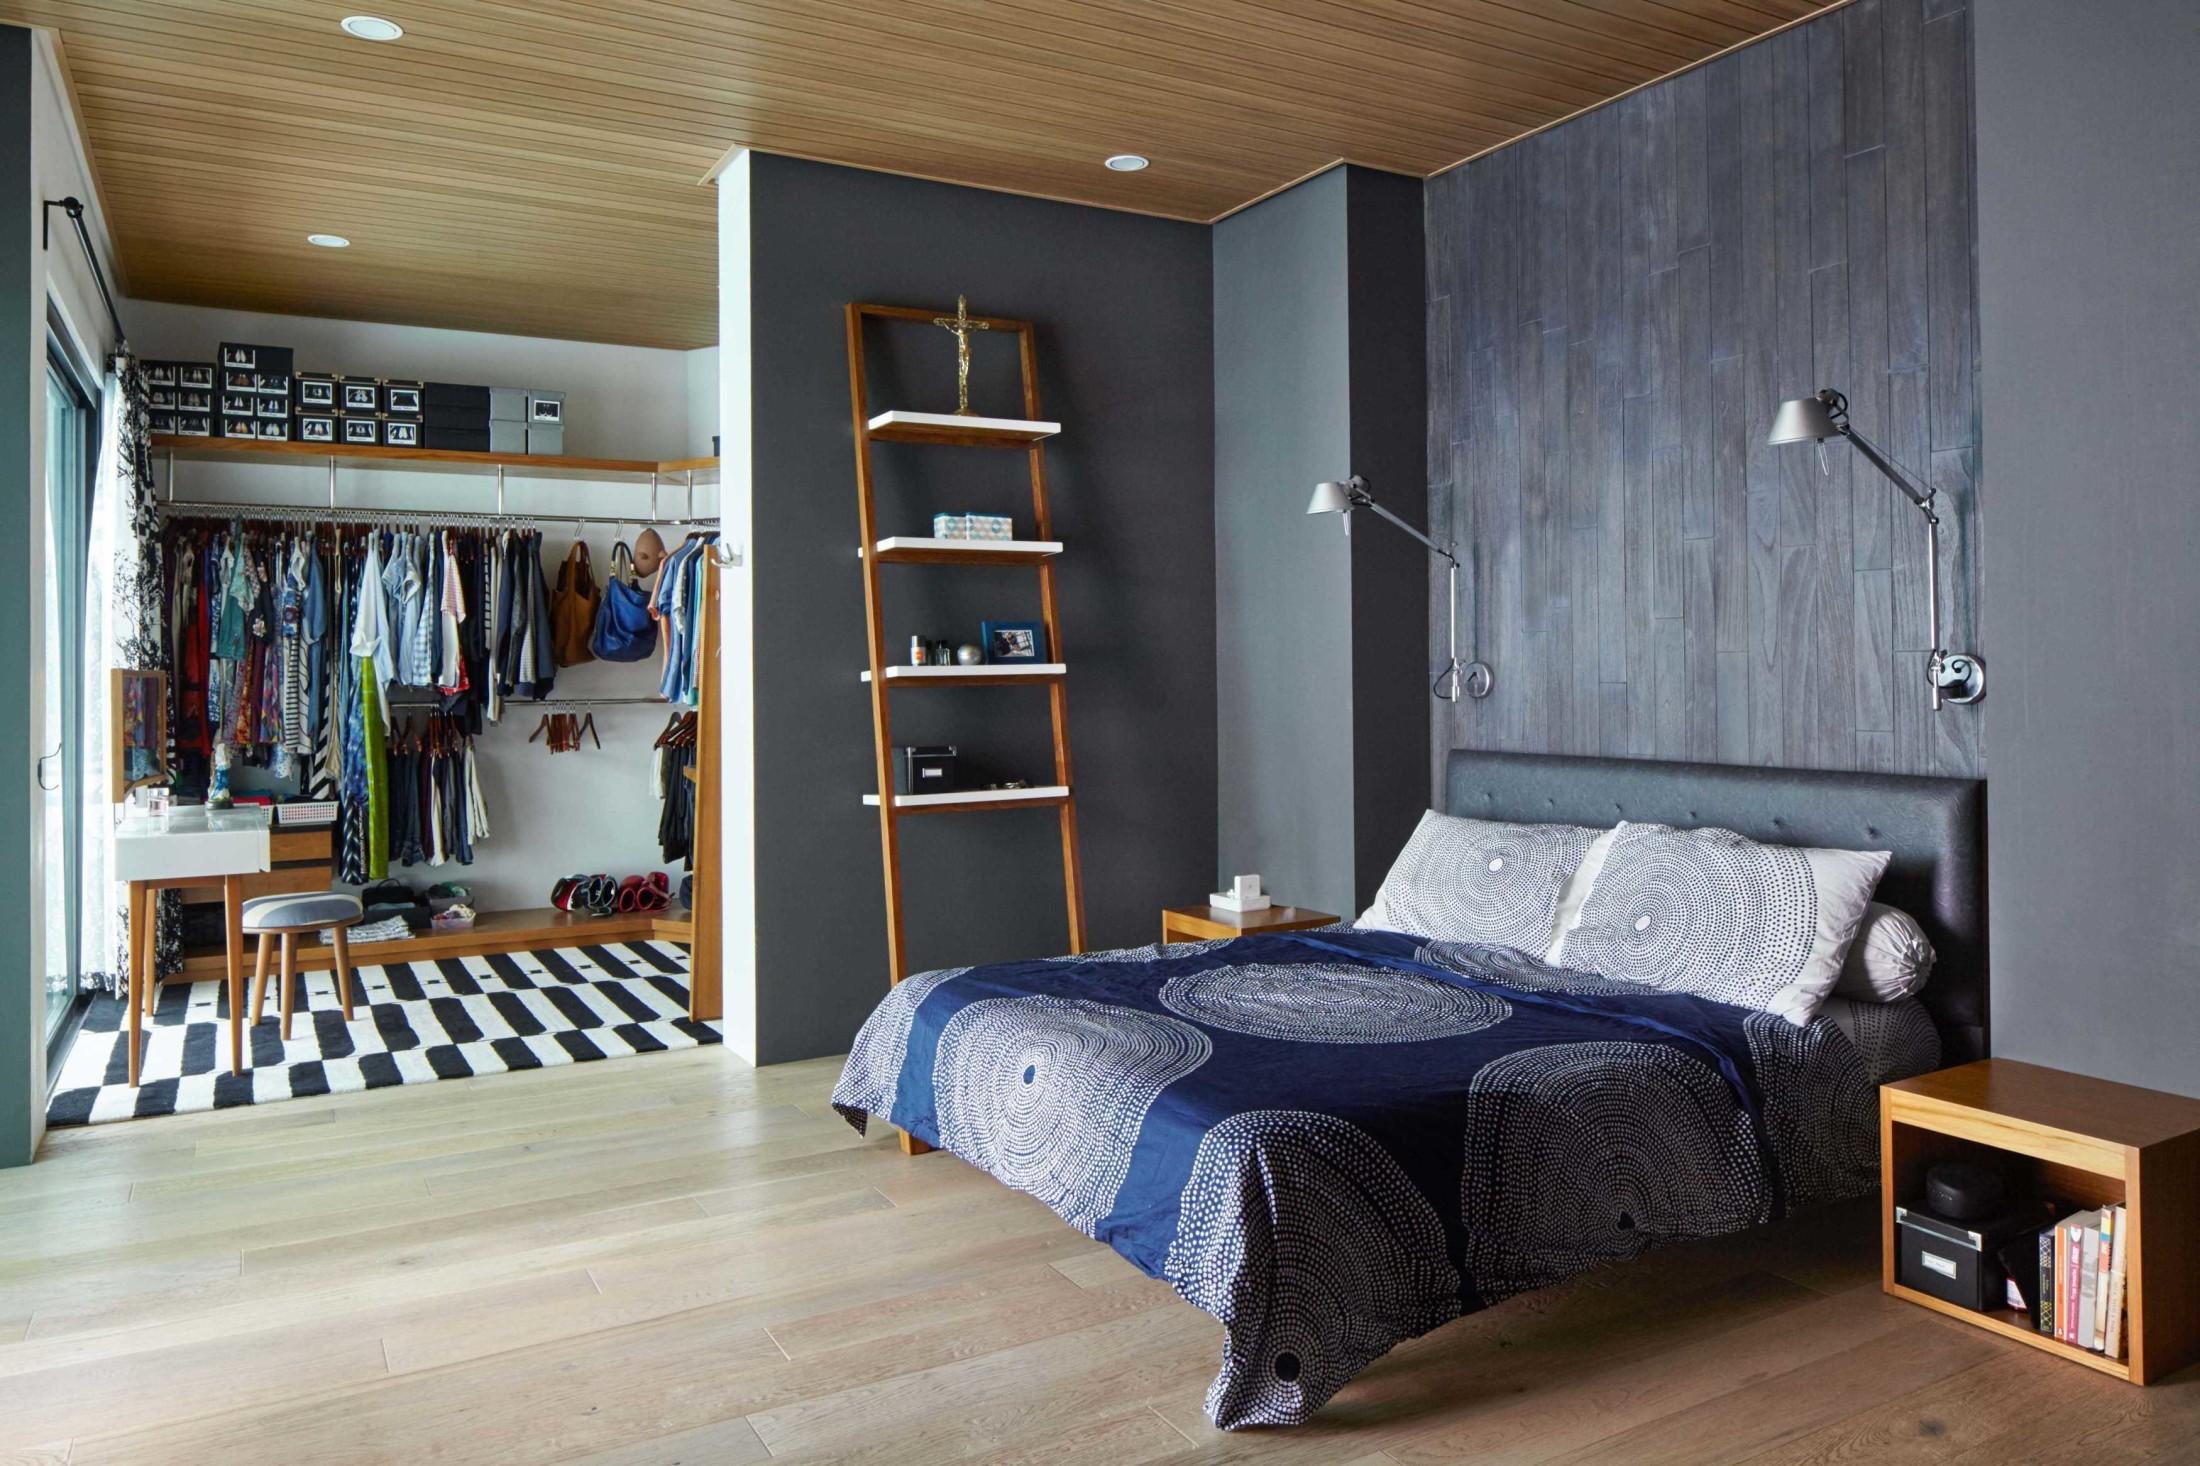 Lantai kayu dan plafon kayu memperkuat kesan penyatuan dengan alam dan memberi kenyamanan (Sumber: arsitag.com)